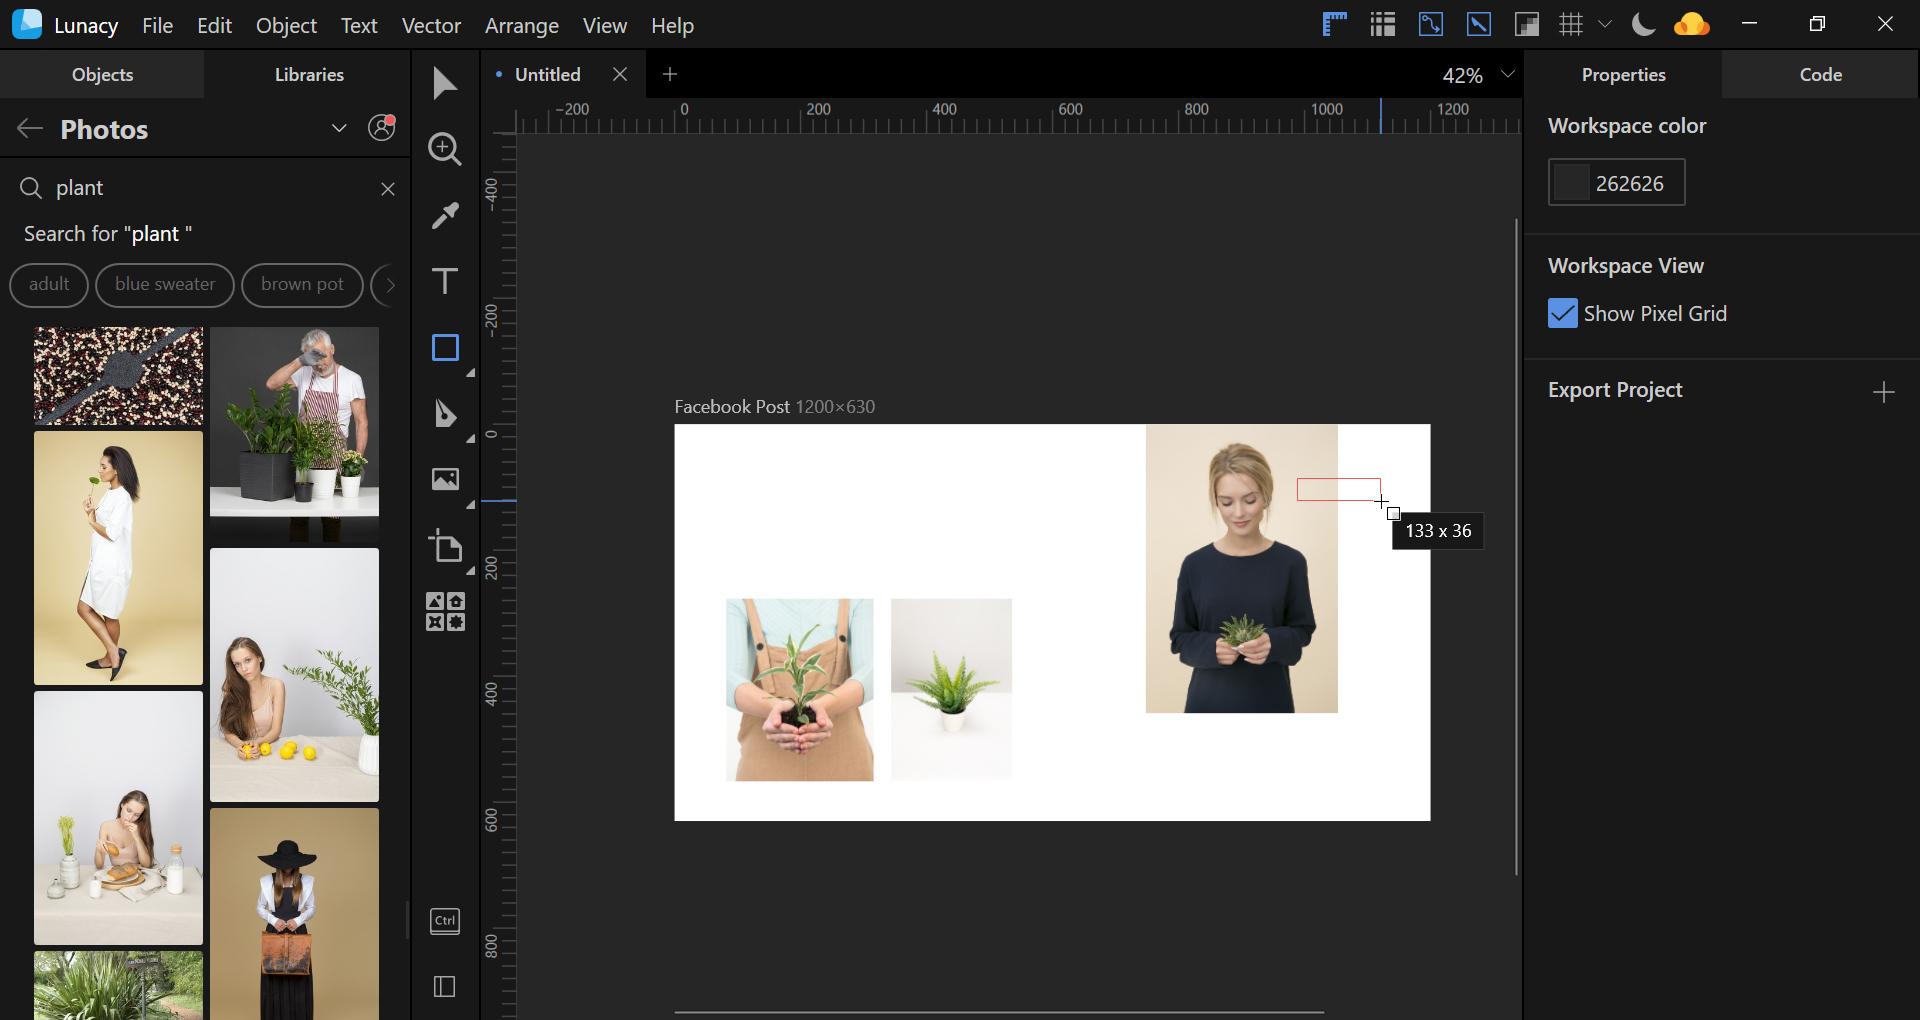 Lunacy design software Facebook Post tutorial